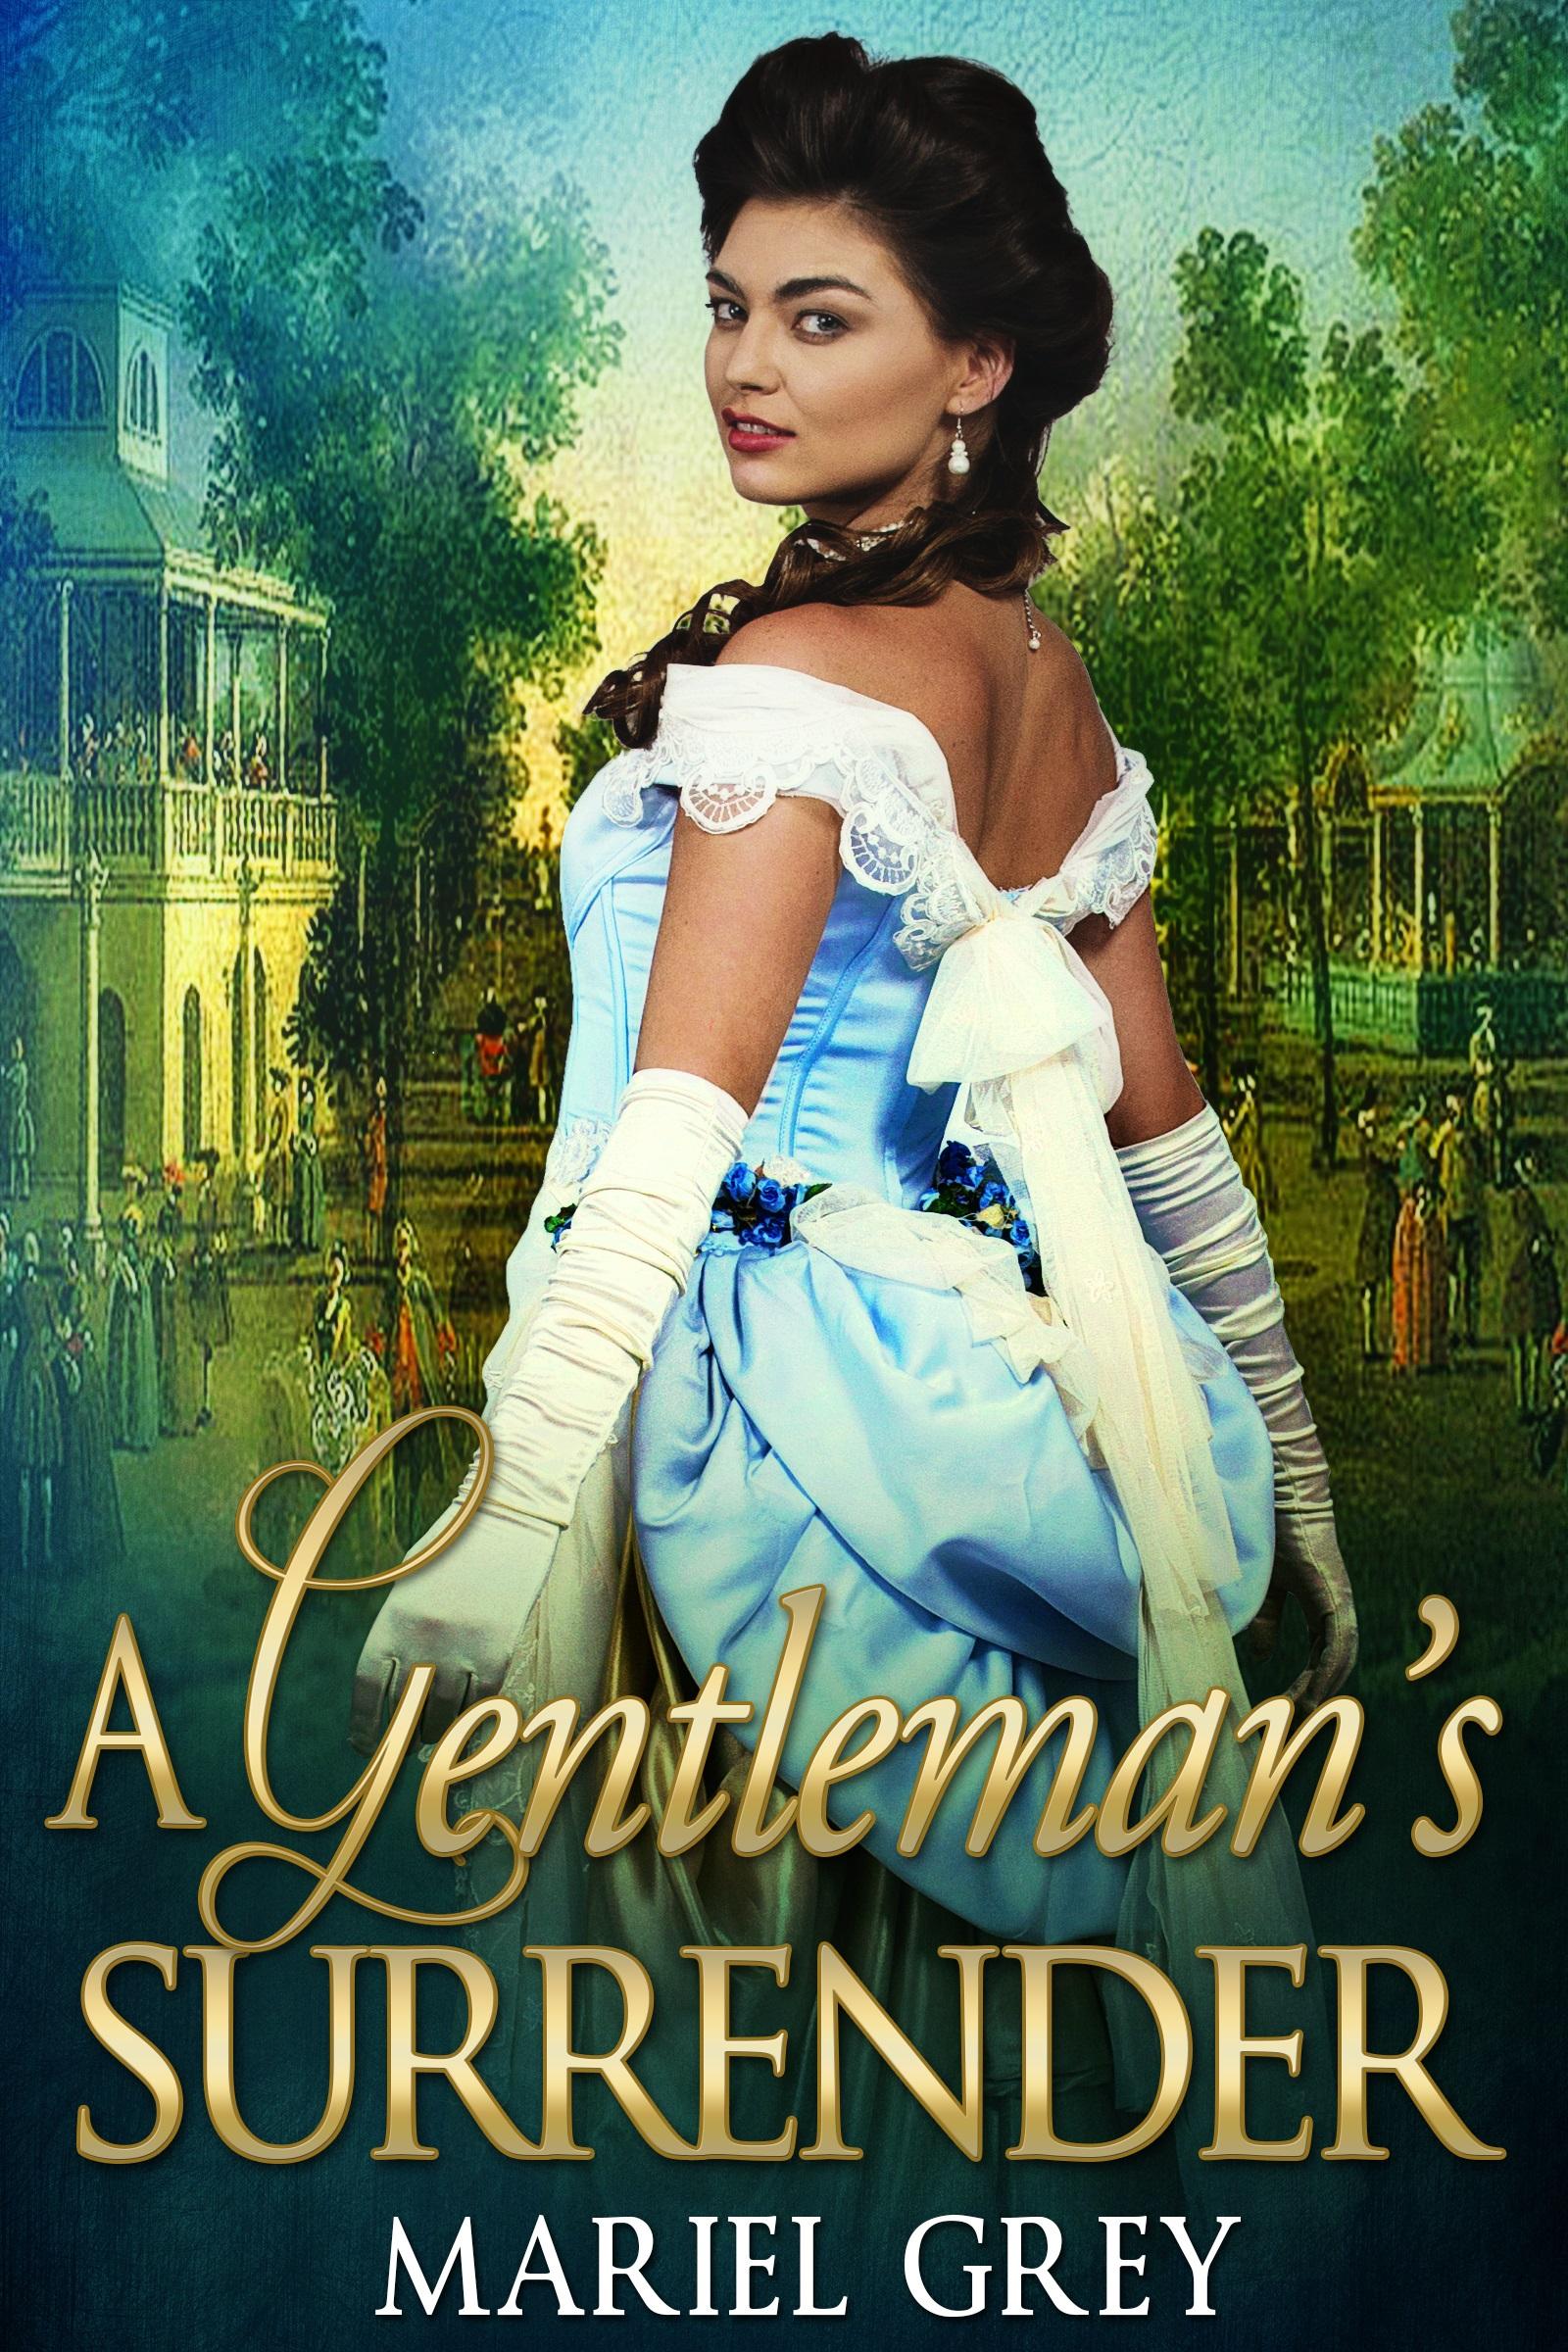 A Gentleman's Surrender by Mariel Grey